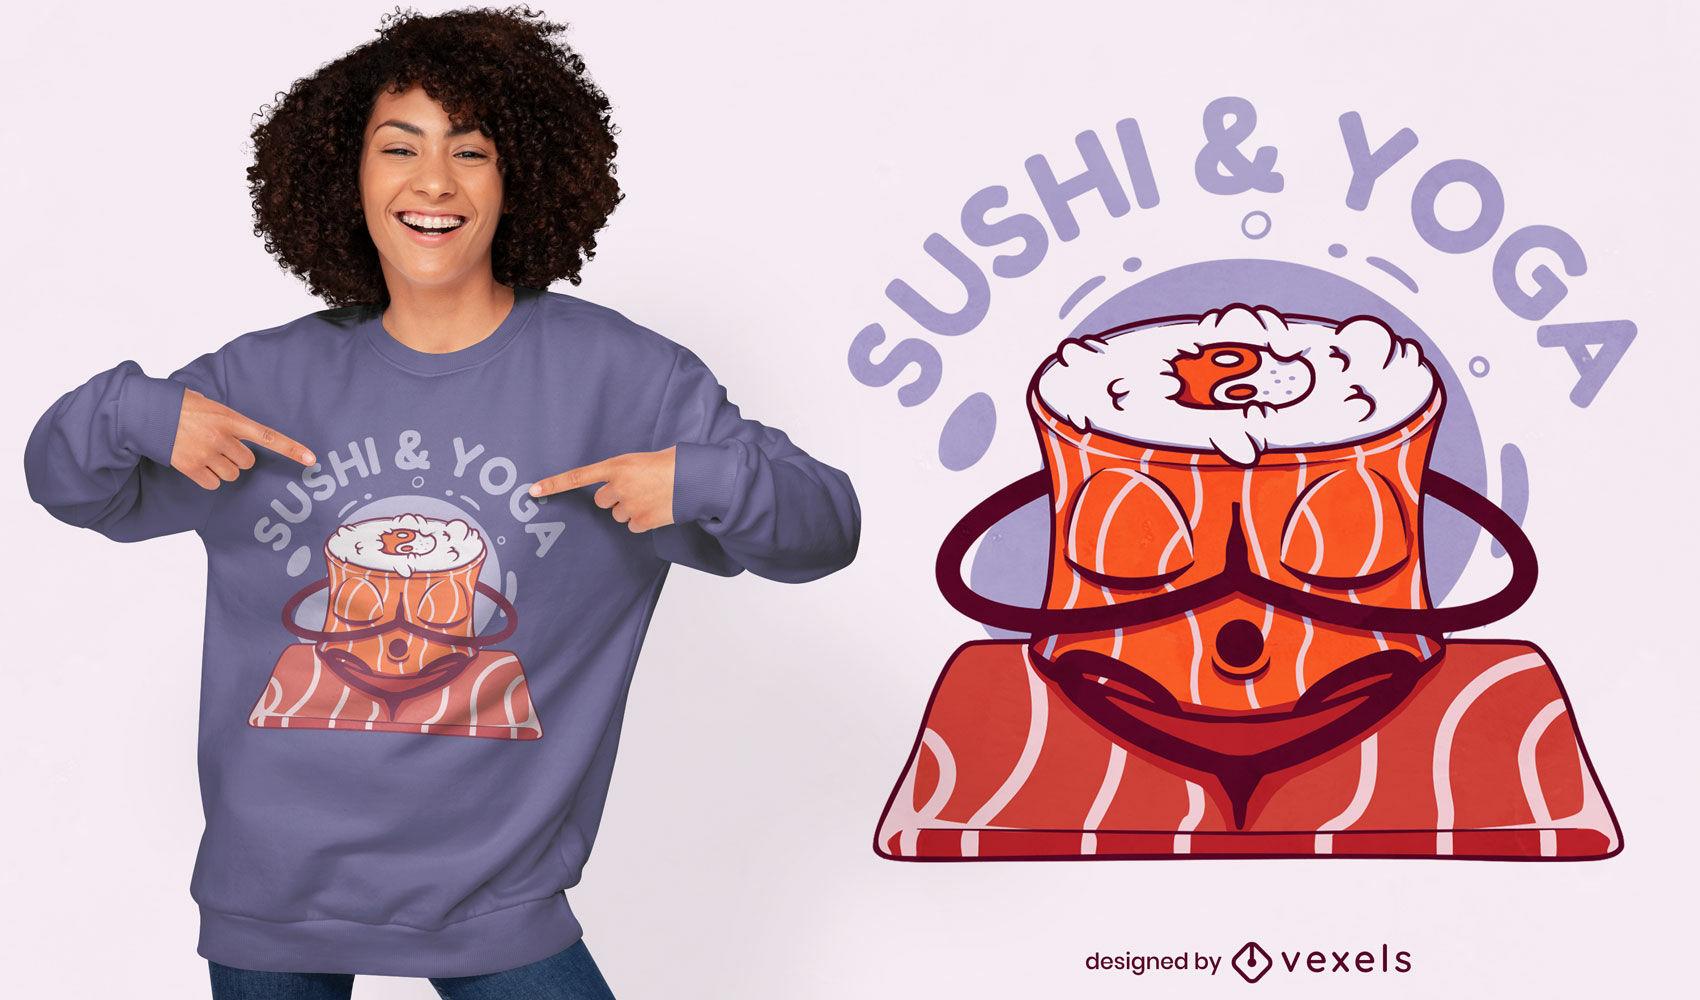 Sushi and yoga t-shirt design